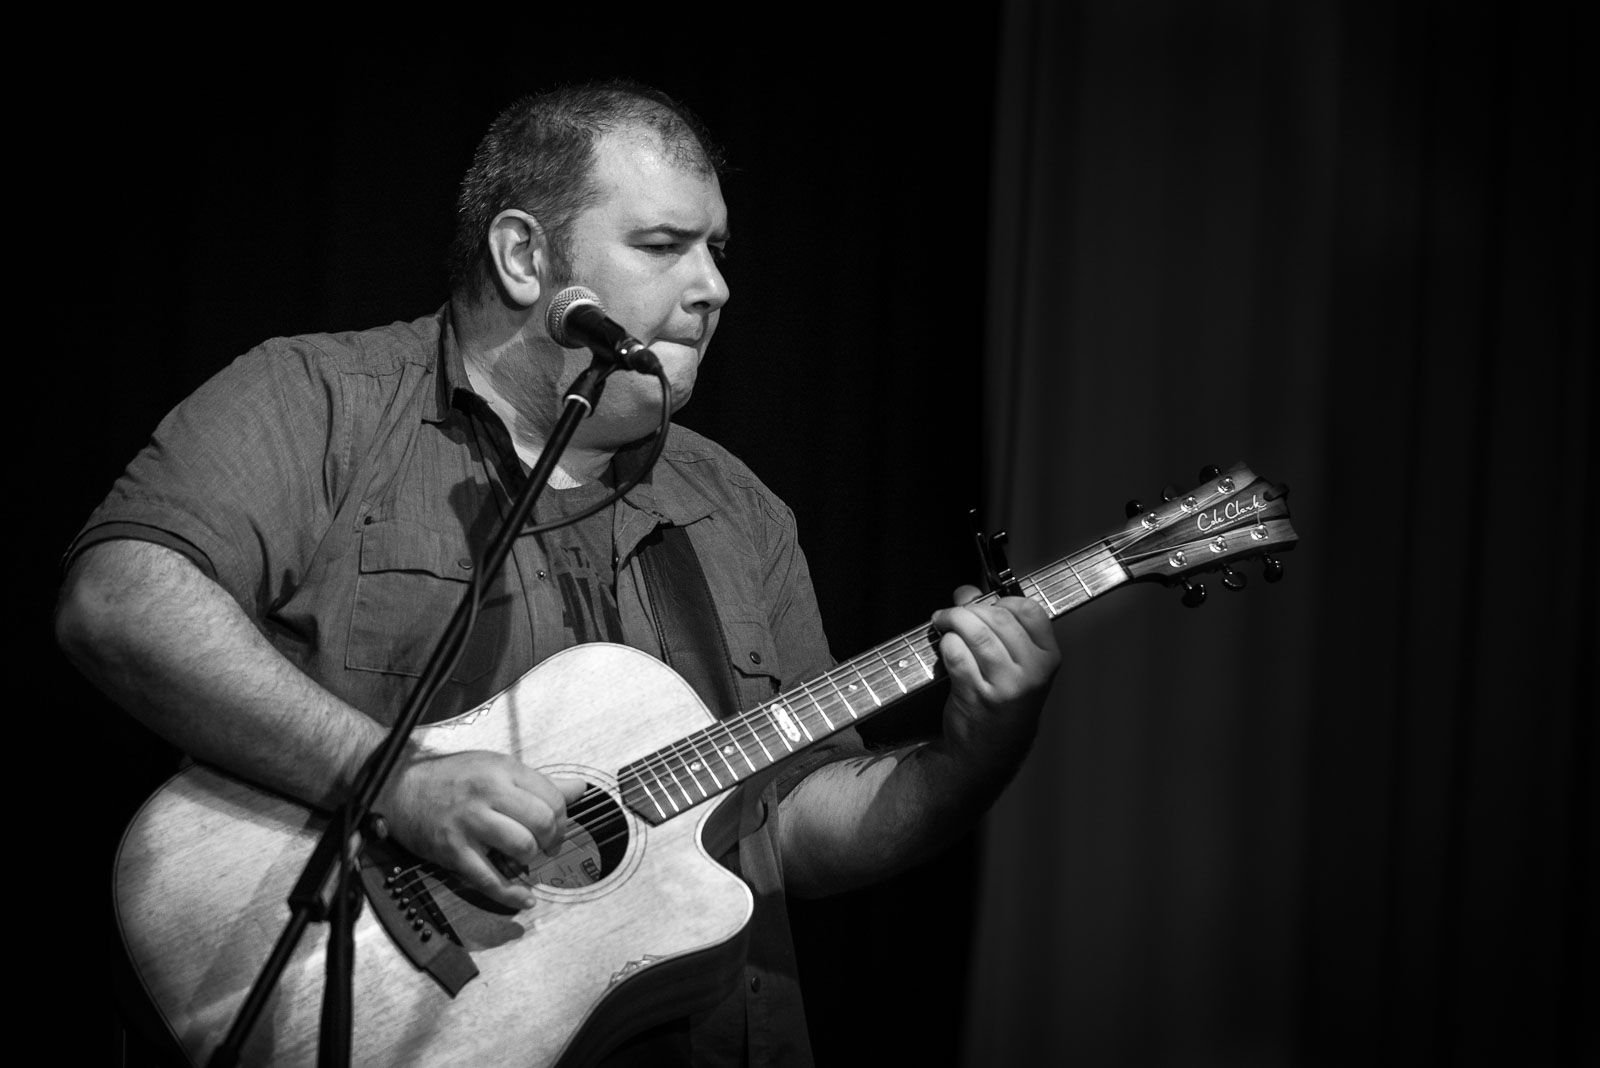 Lloyd Spiegel Concert Parelsessies Utrecht Solo